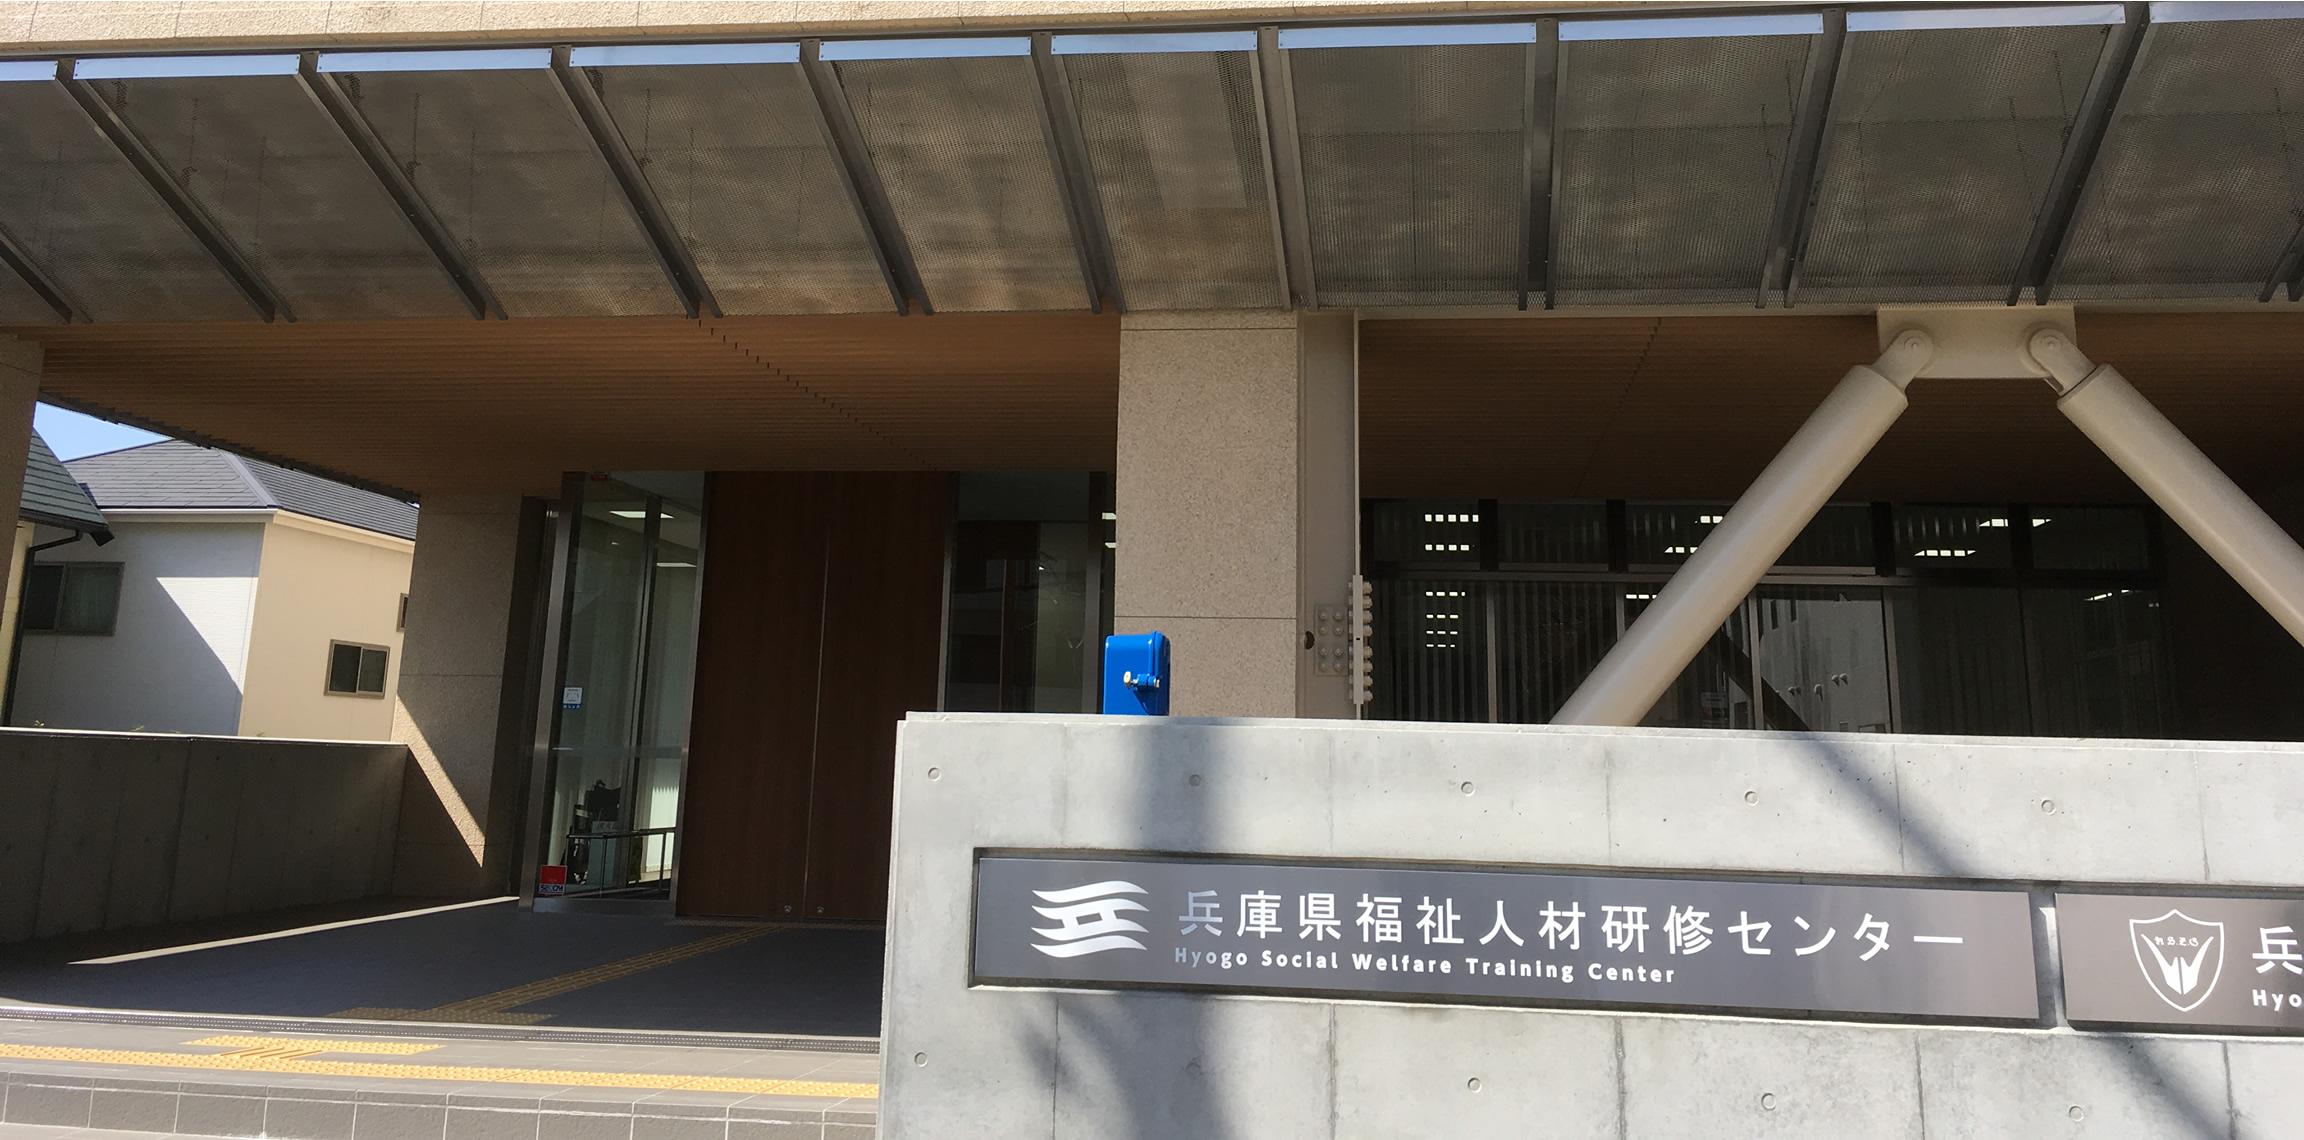 兵庫県福祉人材研修センター外観